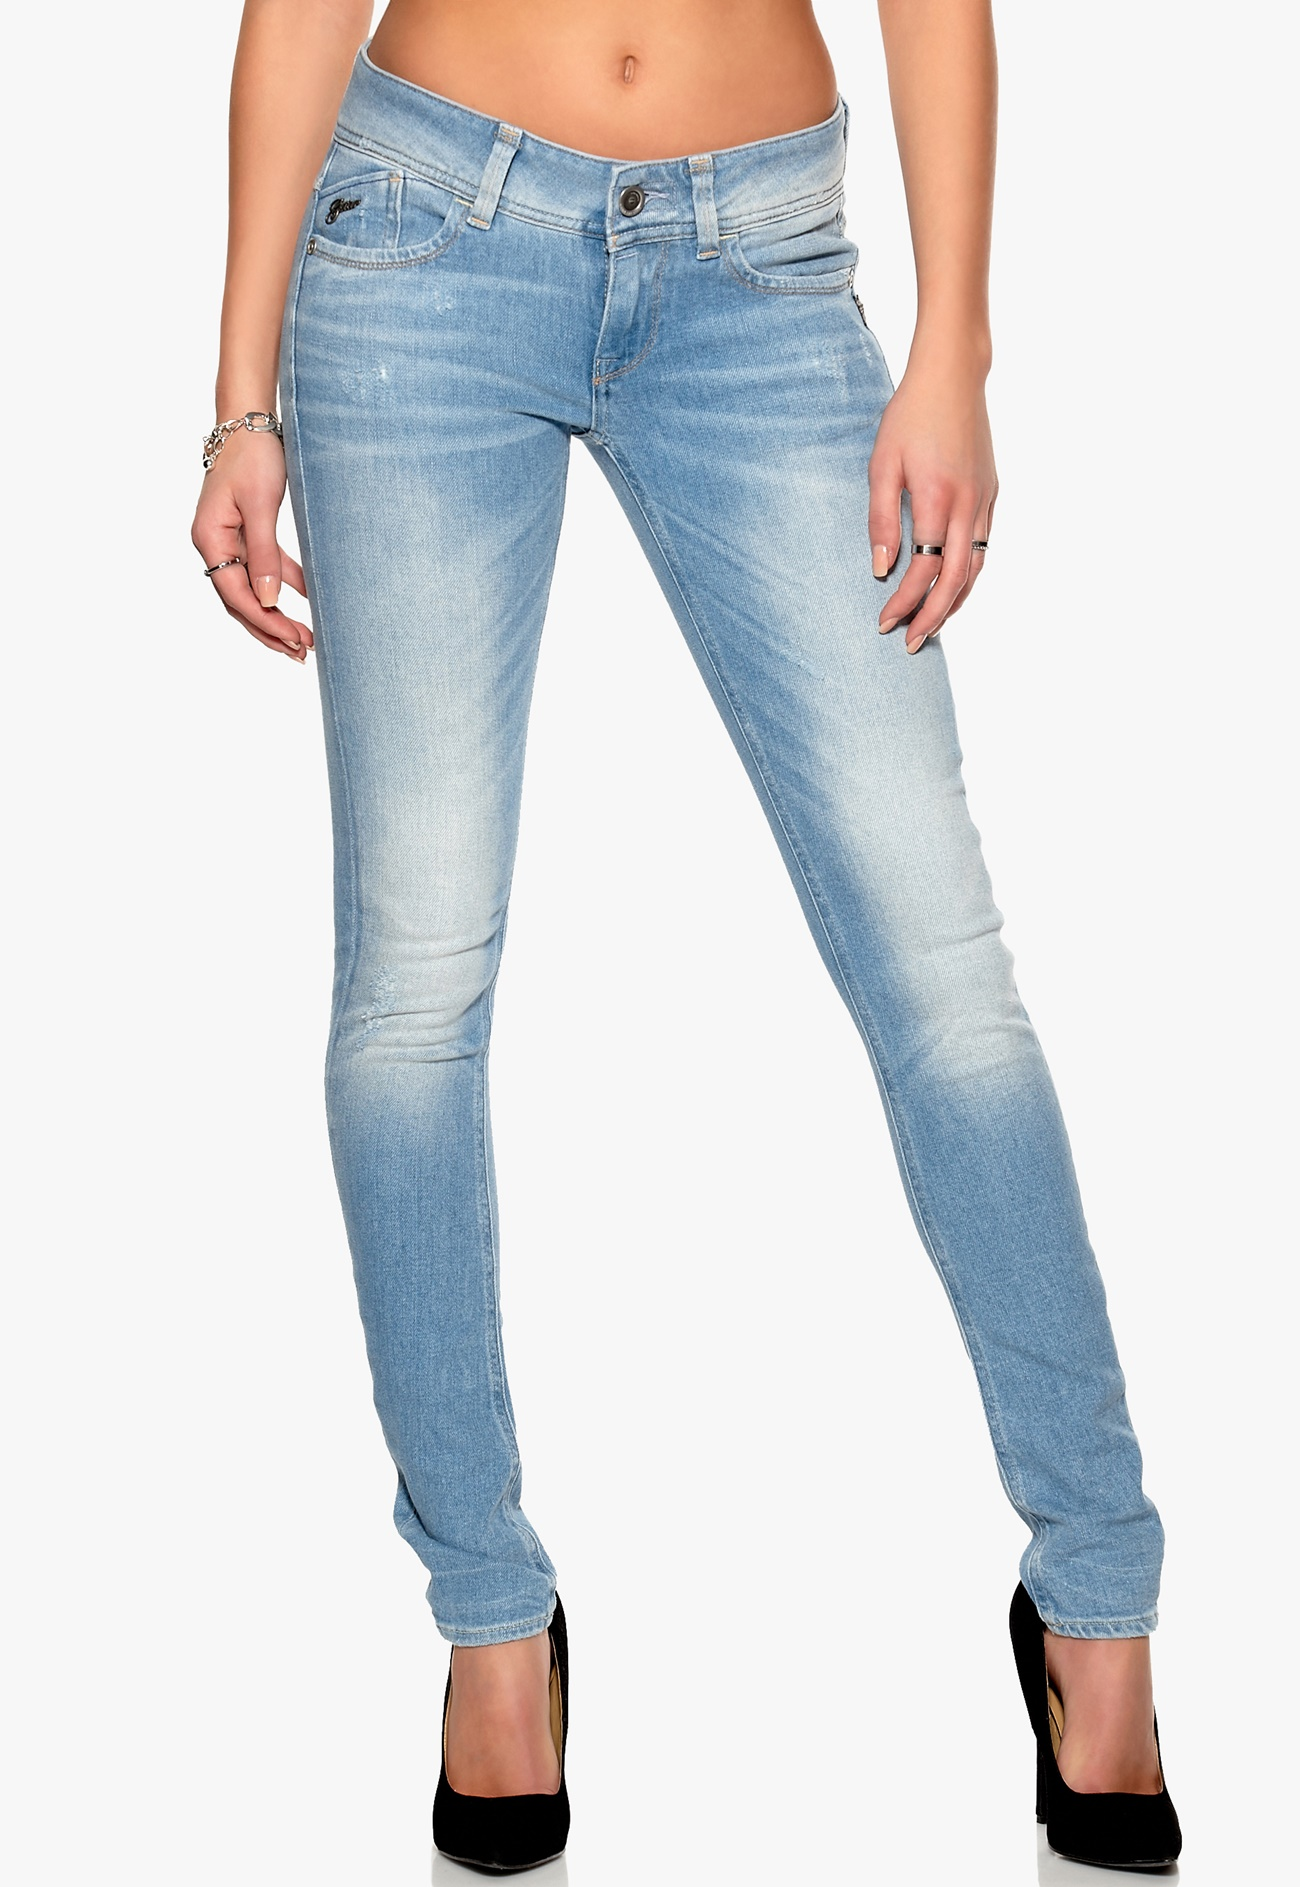 g star lynn skinny jeans 424 medium aged bubbleroom. Black Bedroom Furniture Sets. Home Design Ideas